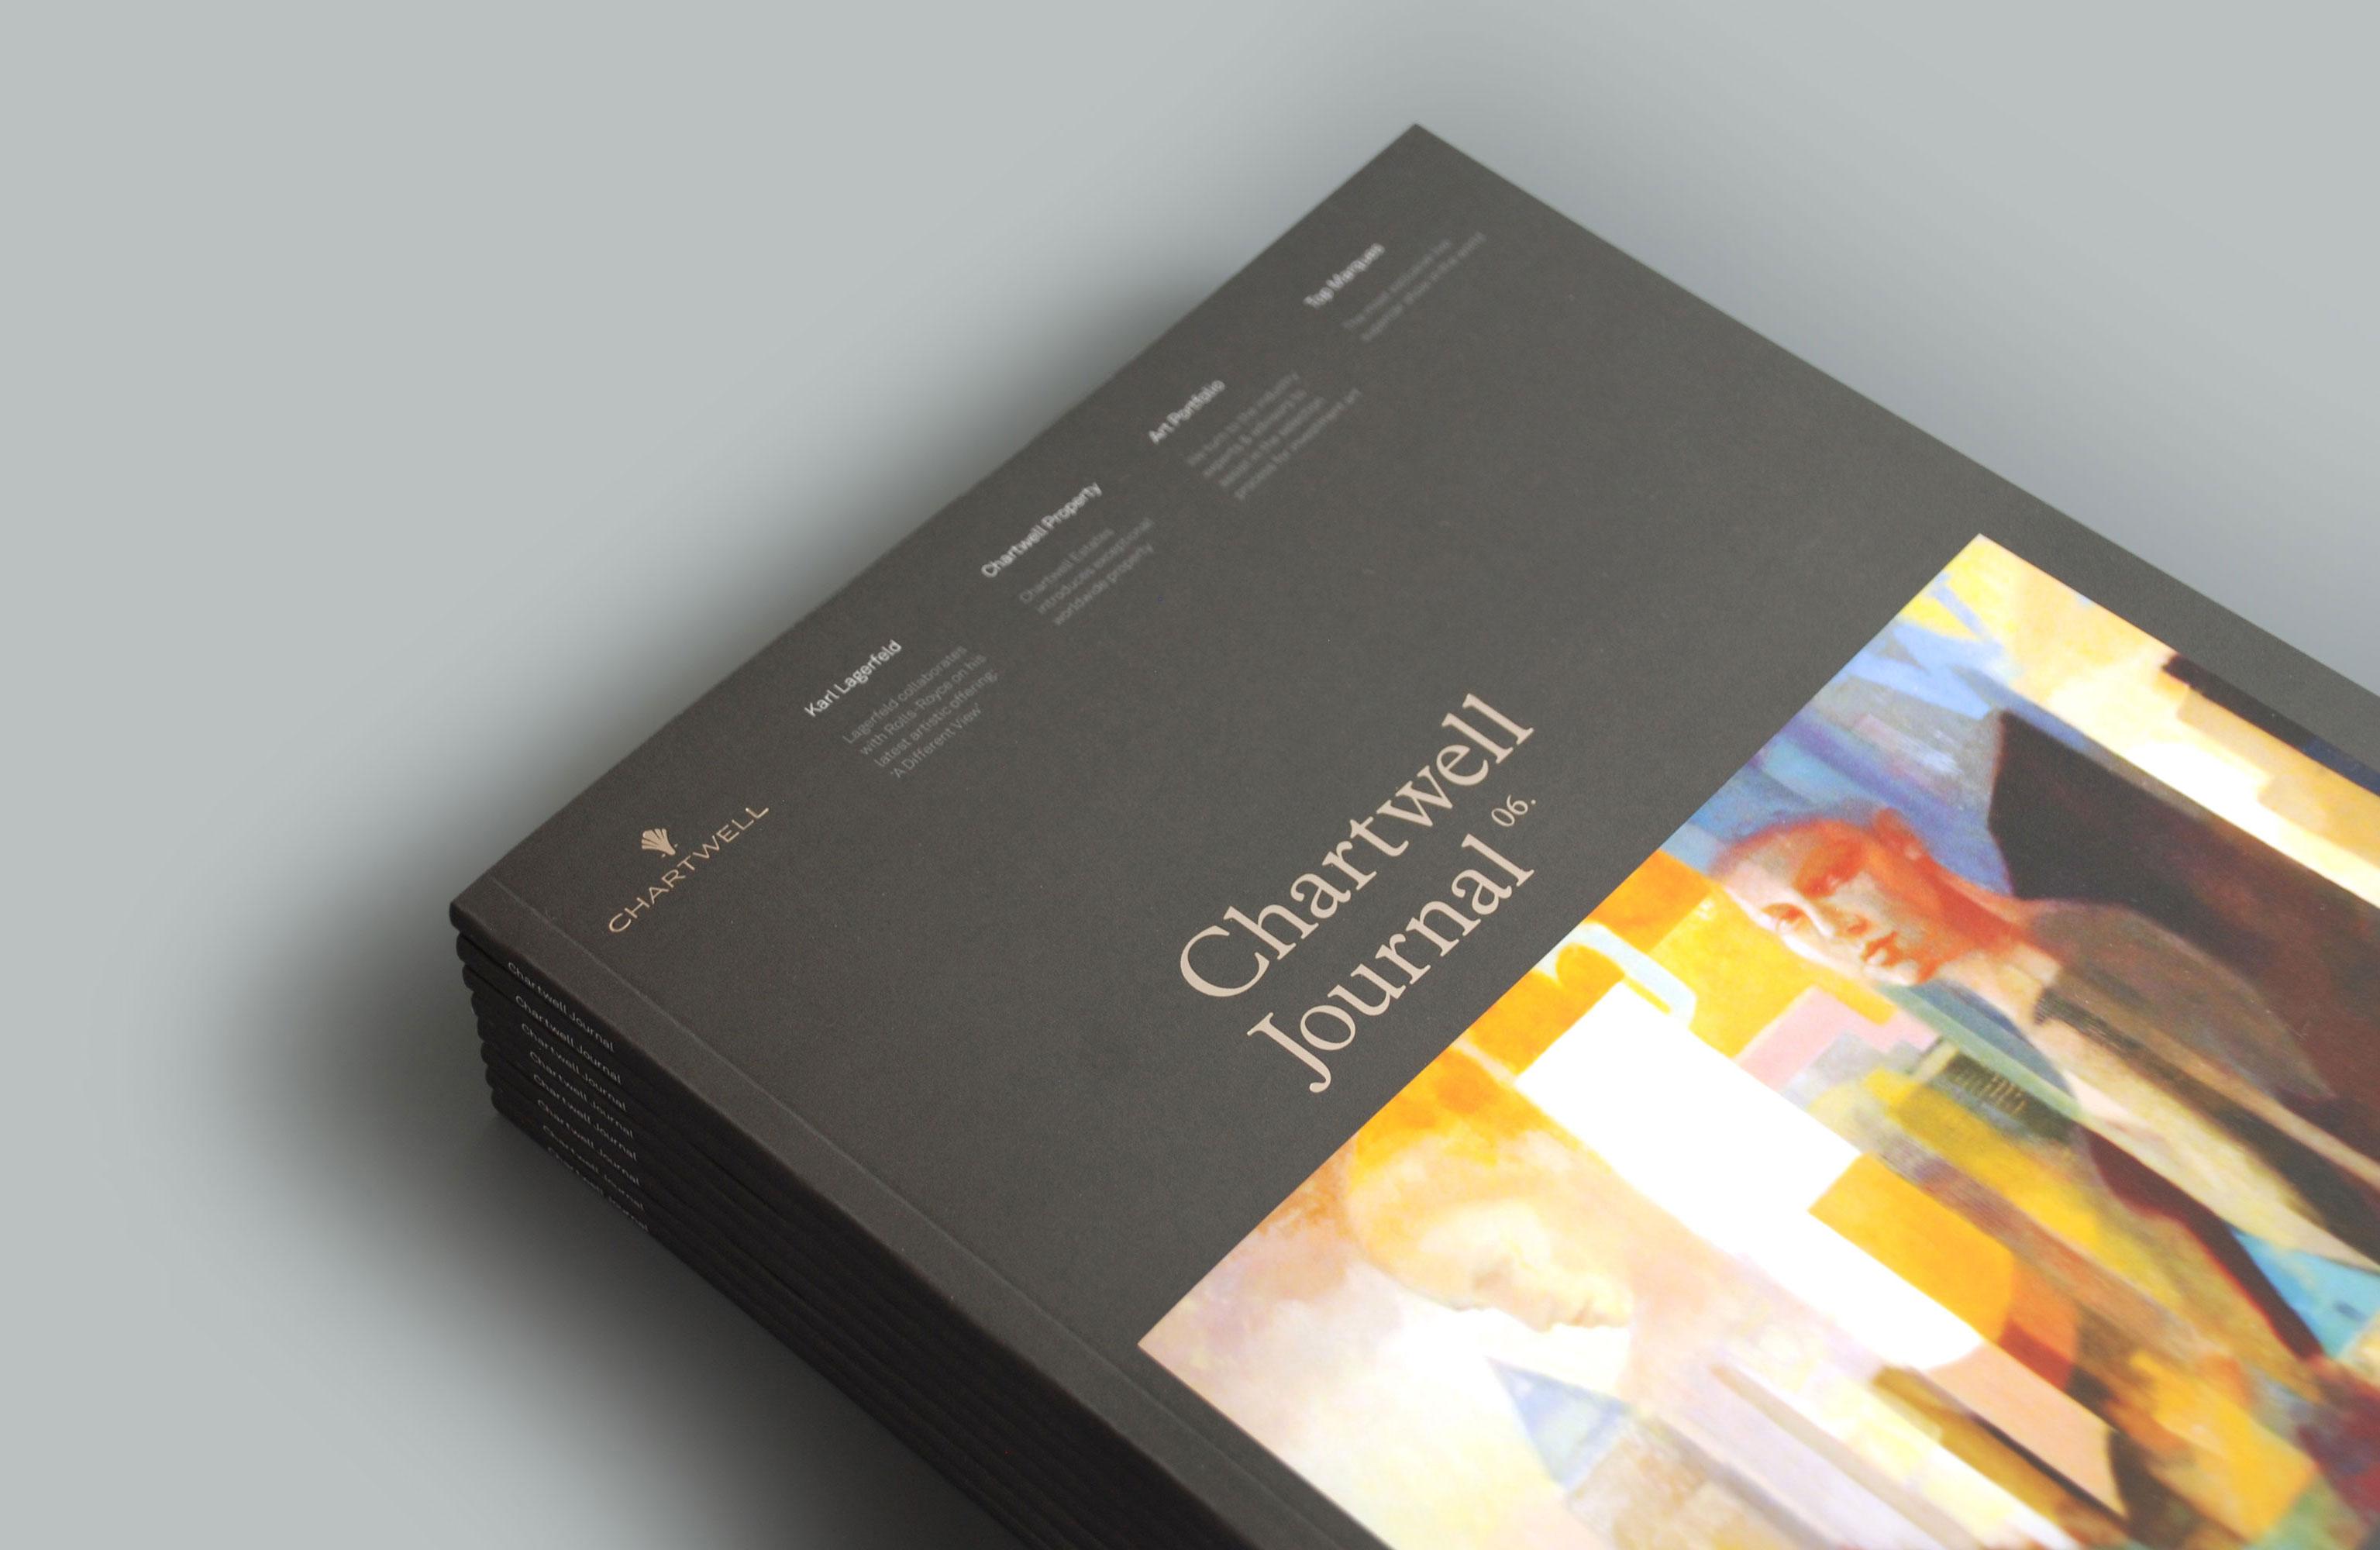 Bespoke publishing for luxury brand alignment